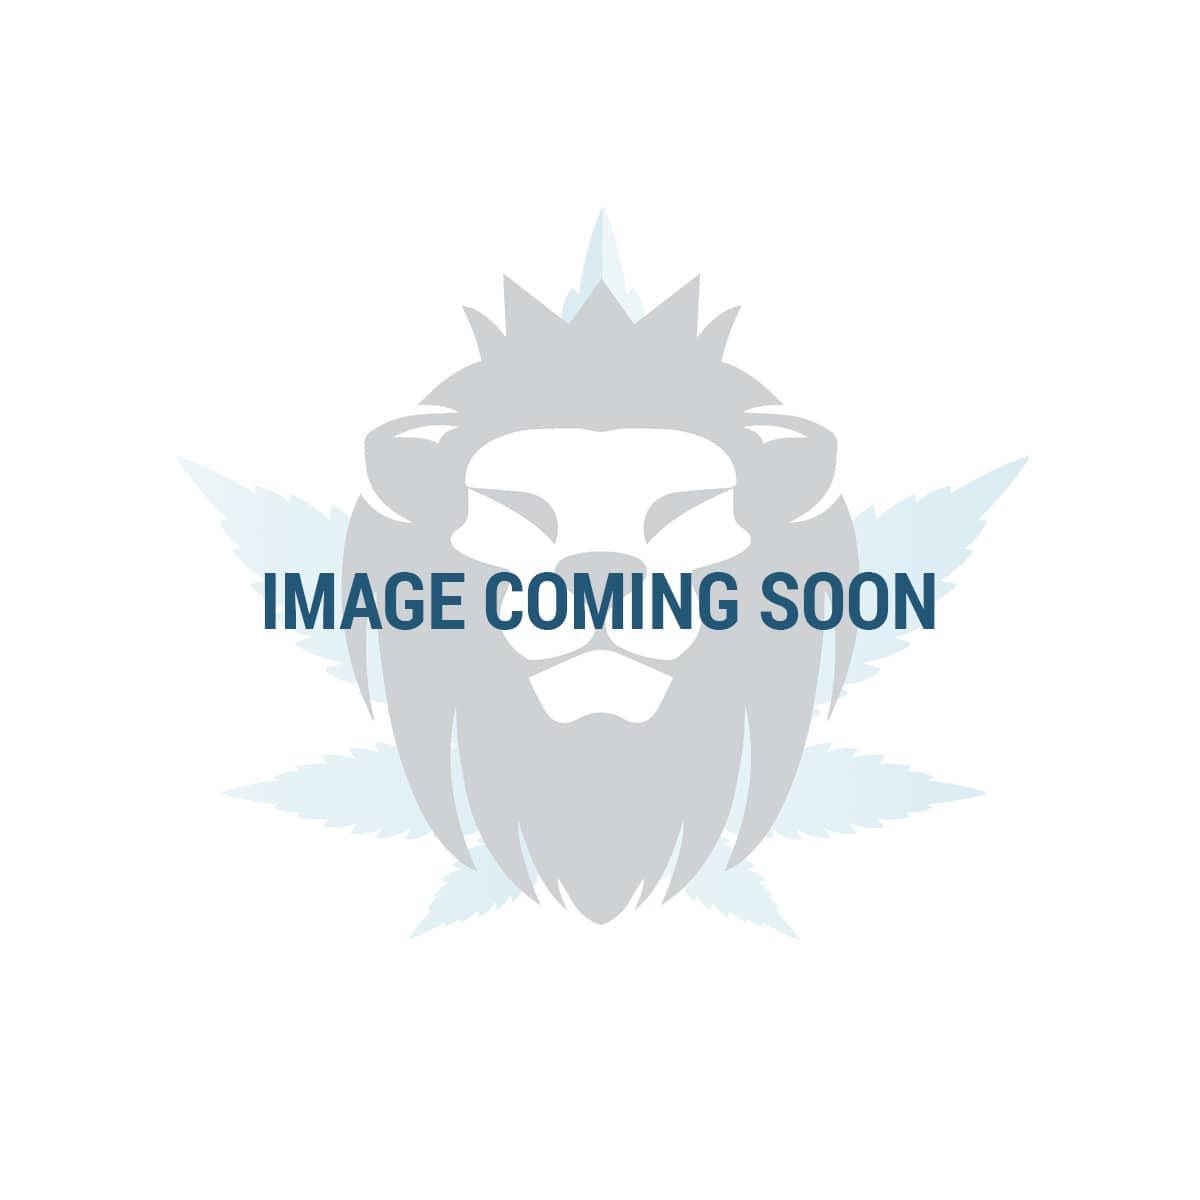 25R Batteries (2 Pack)